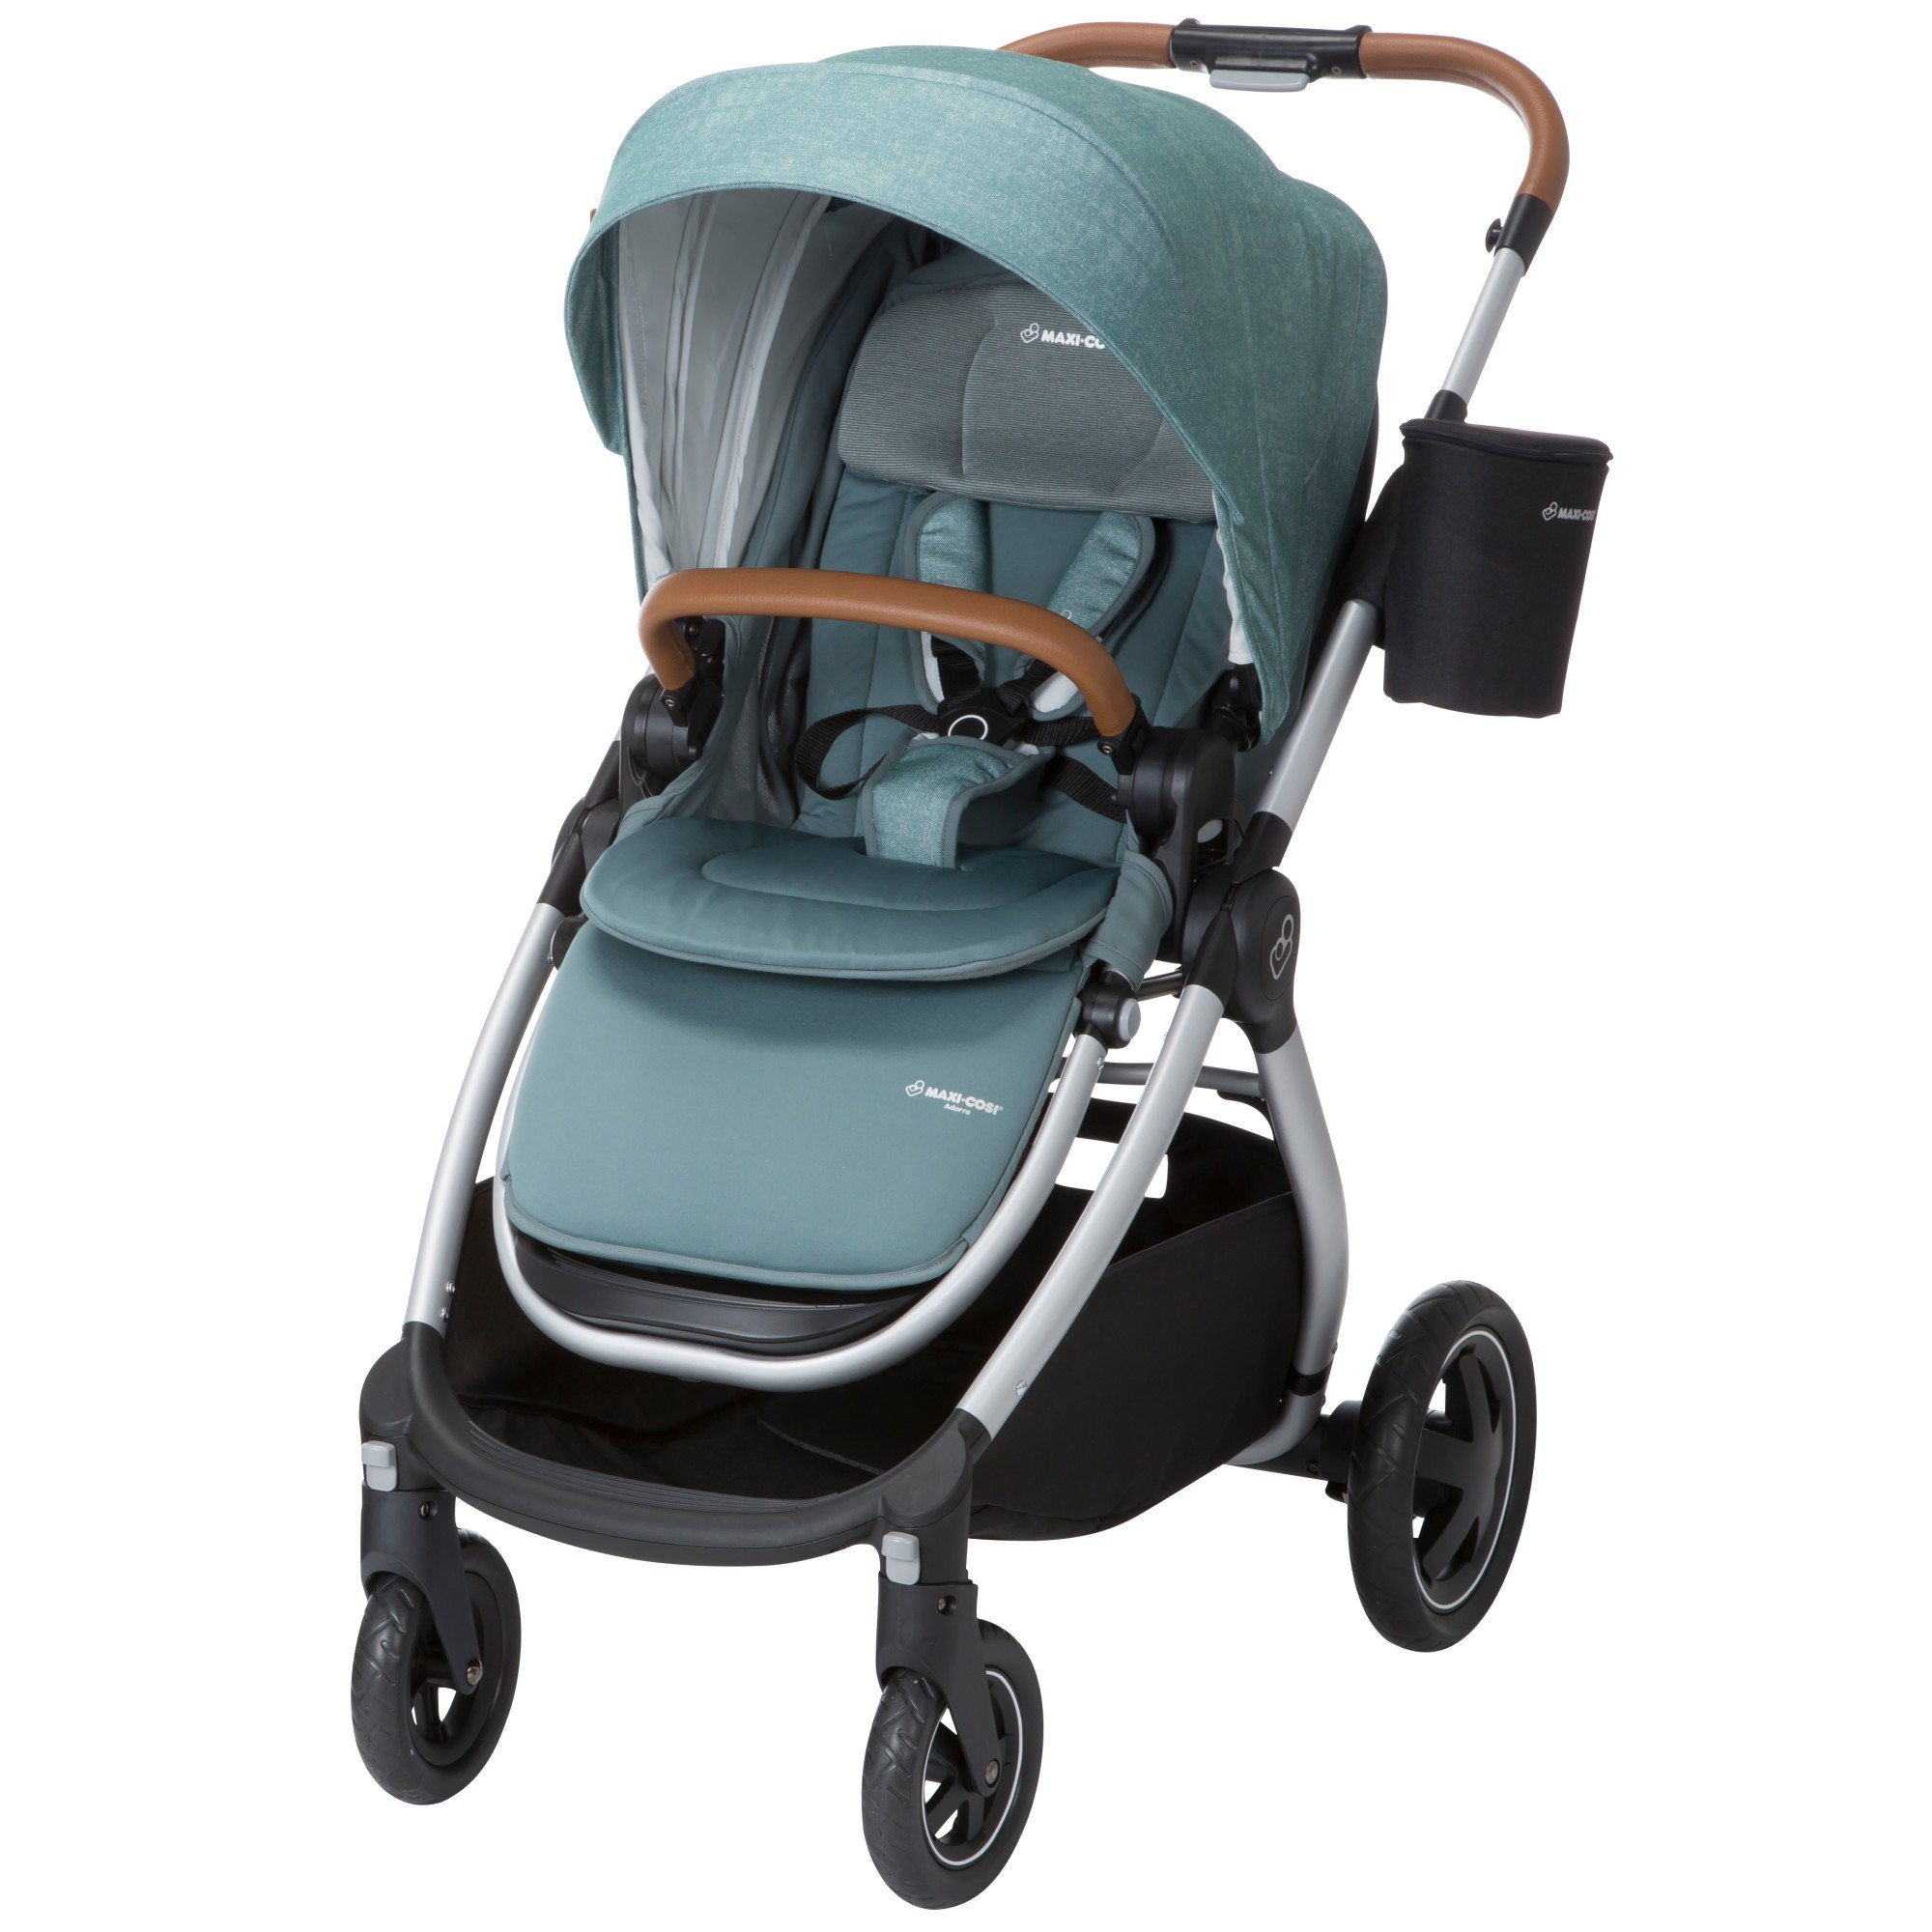 maxi cosi mico max 30 infant car seat nomad. Black Bedroom Furniture Sets. Home Design Ideas